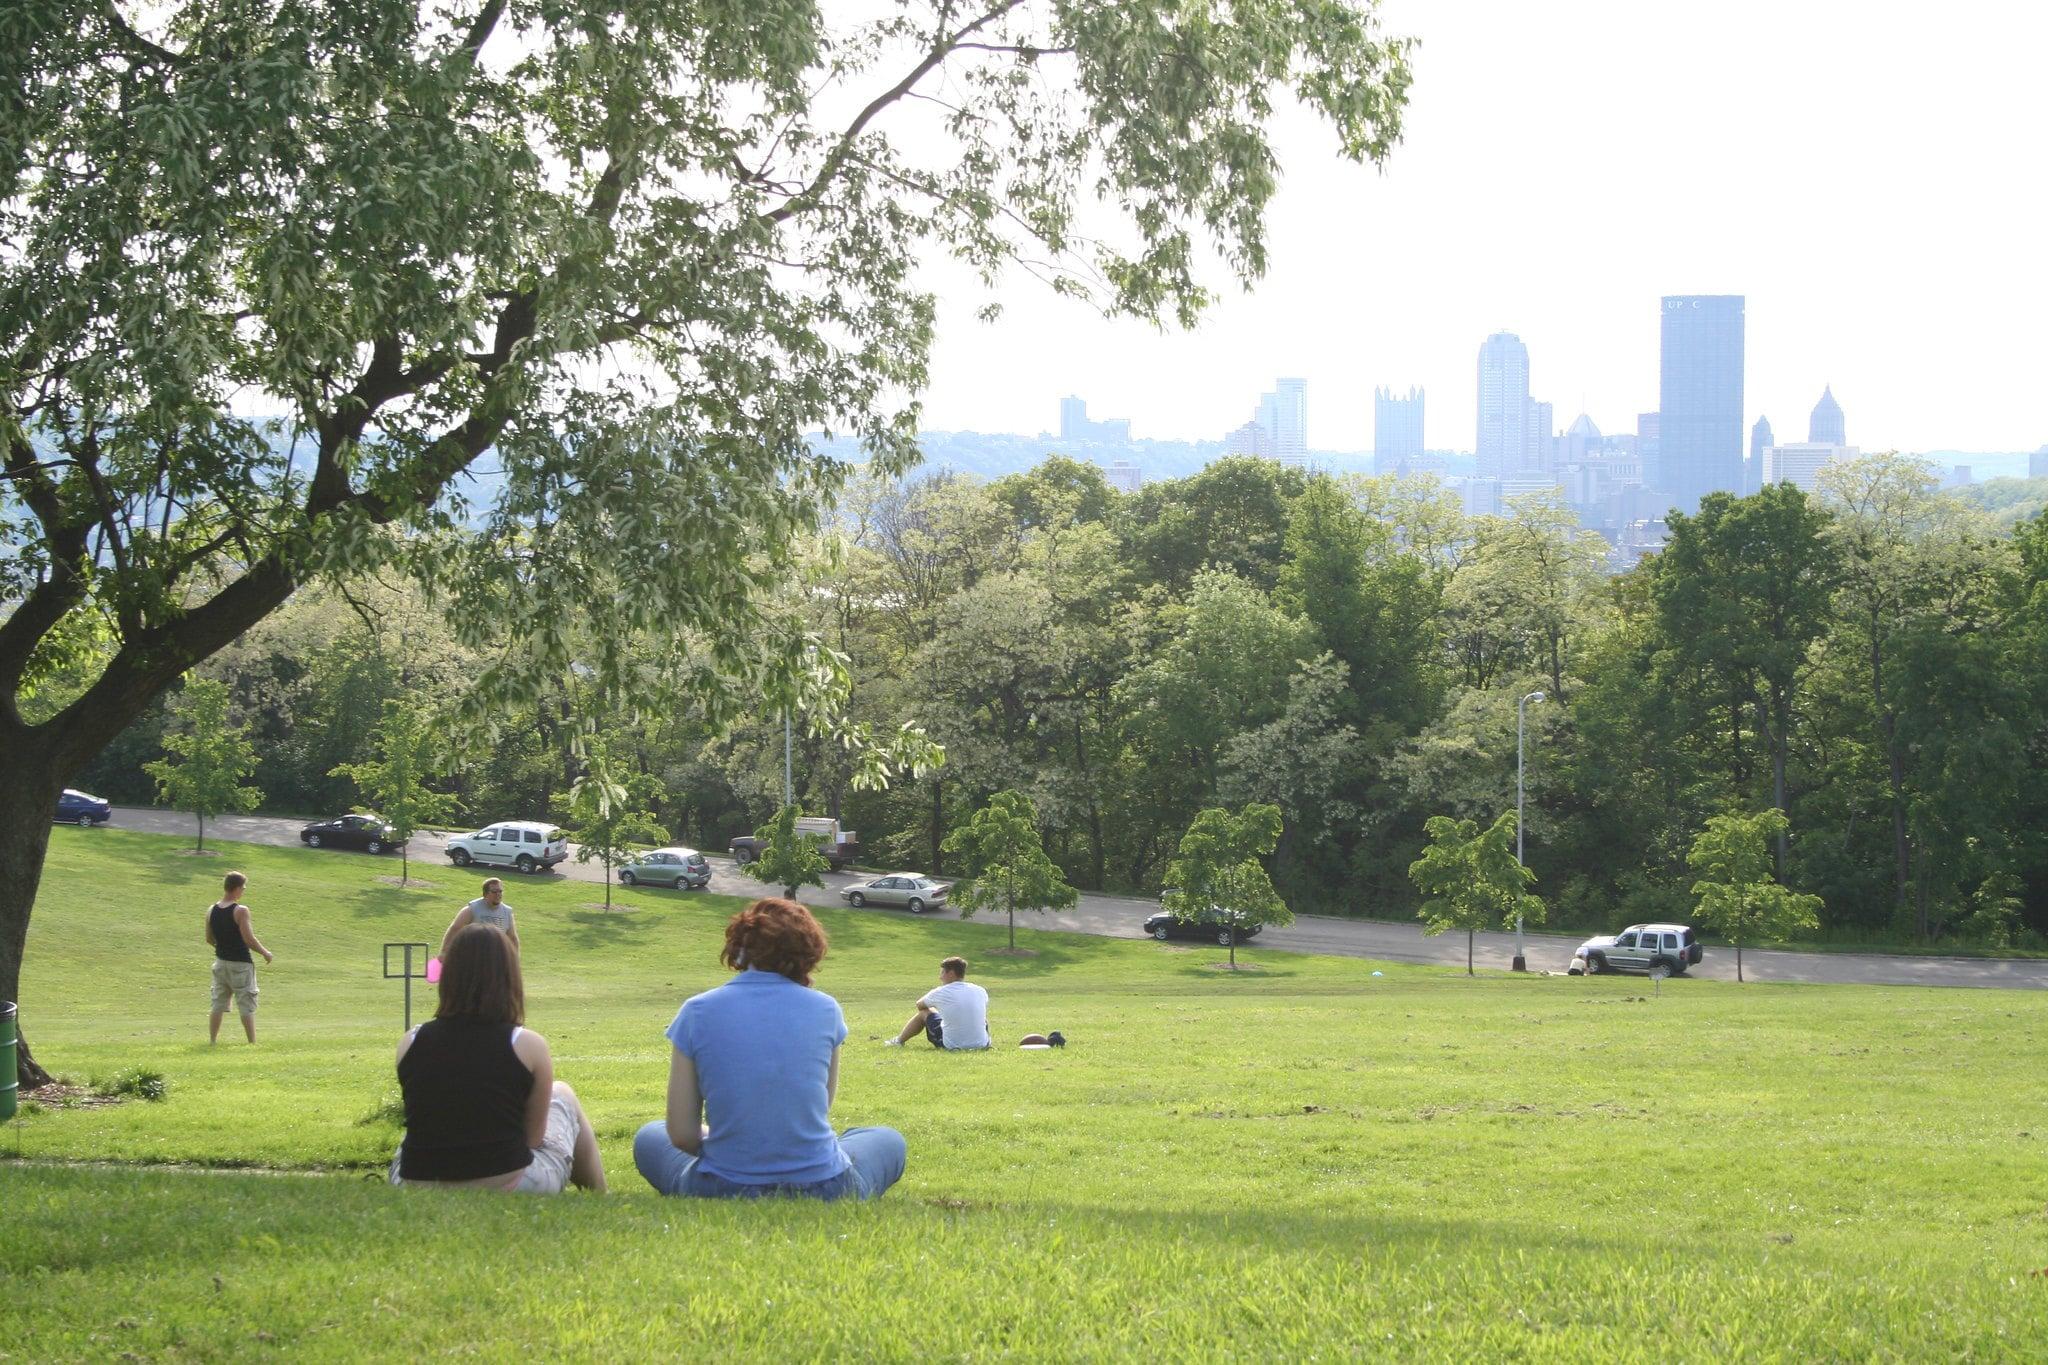 People sitting in a field in Schenley Park